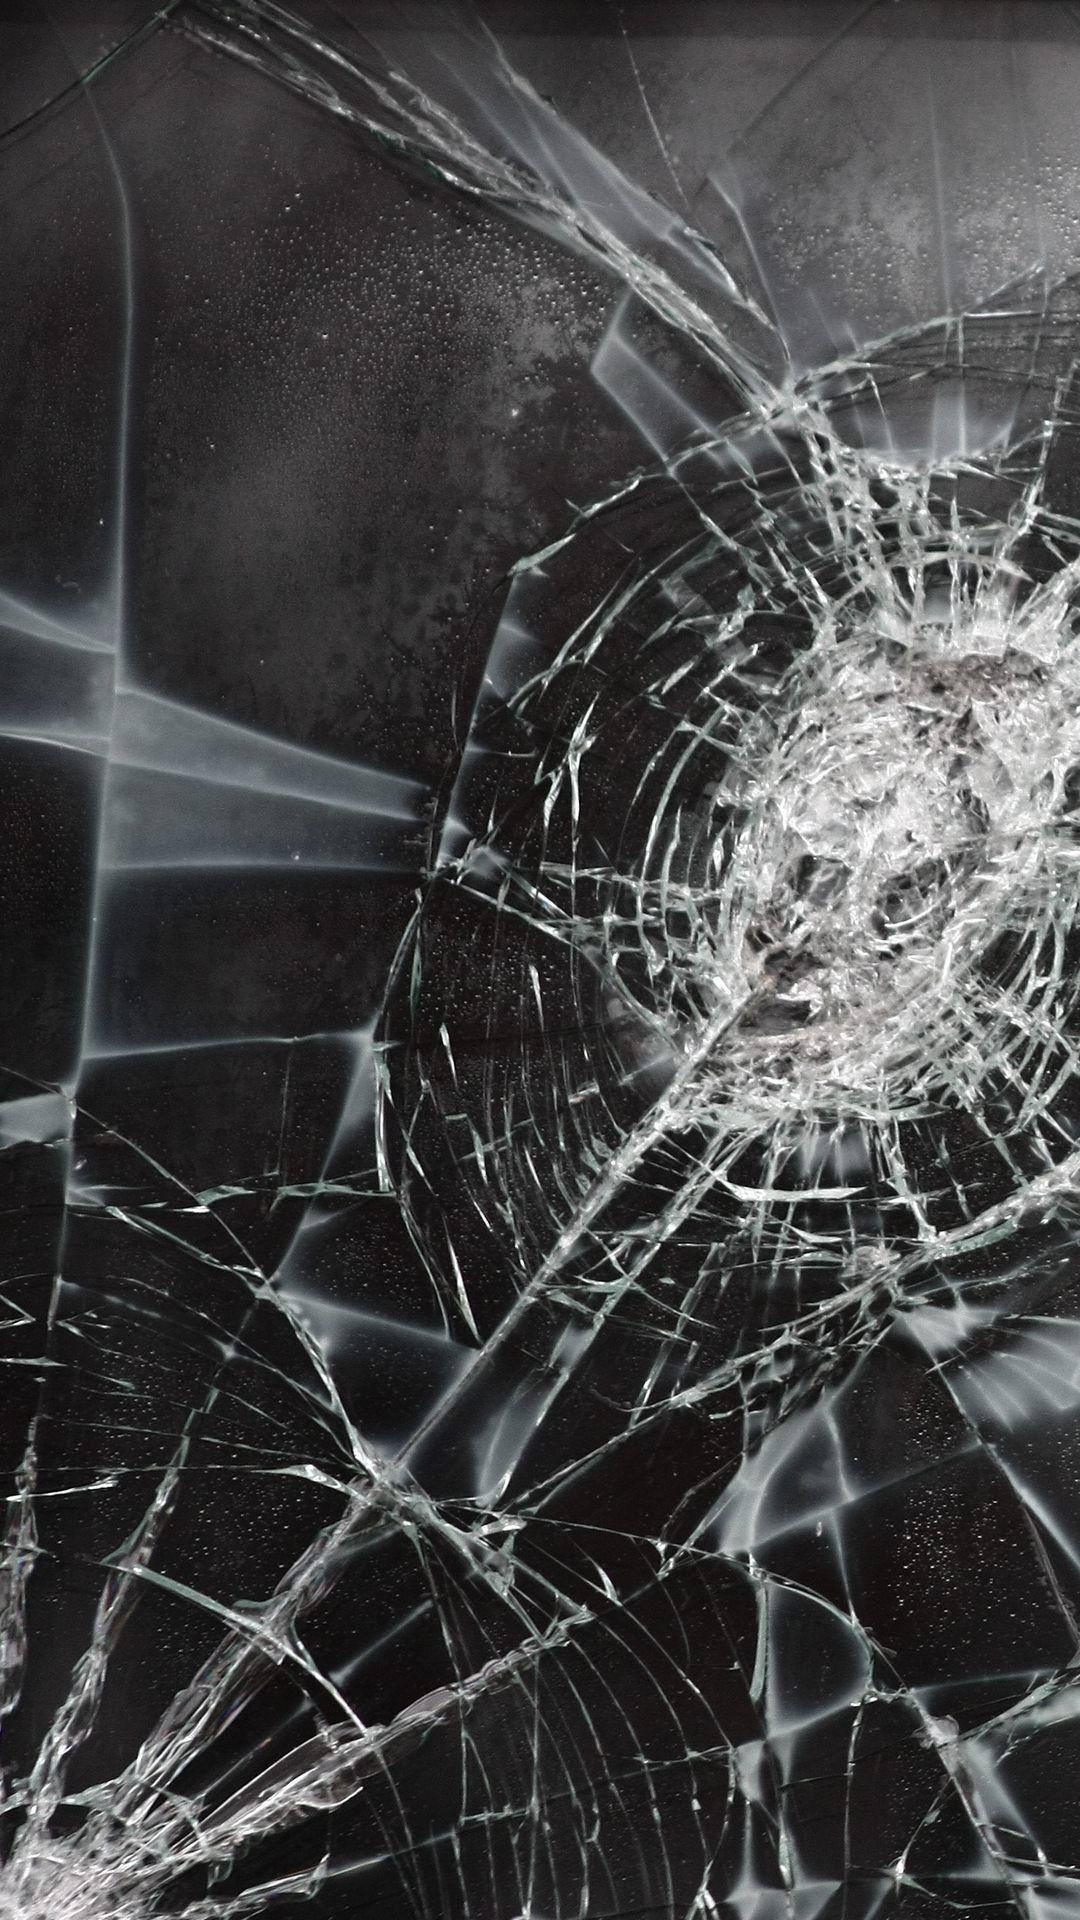 Broken Glass Wallpapers HD - Wallpaper Cave